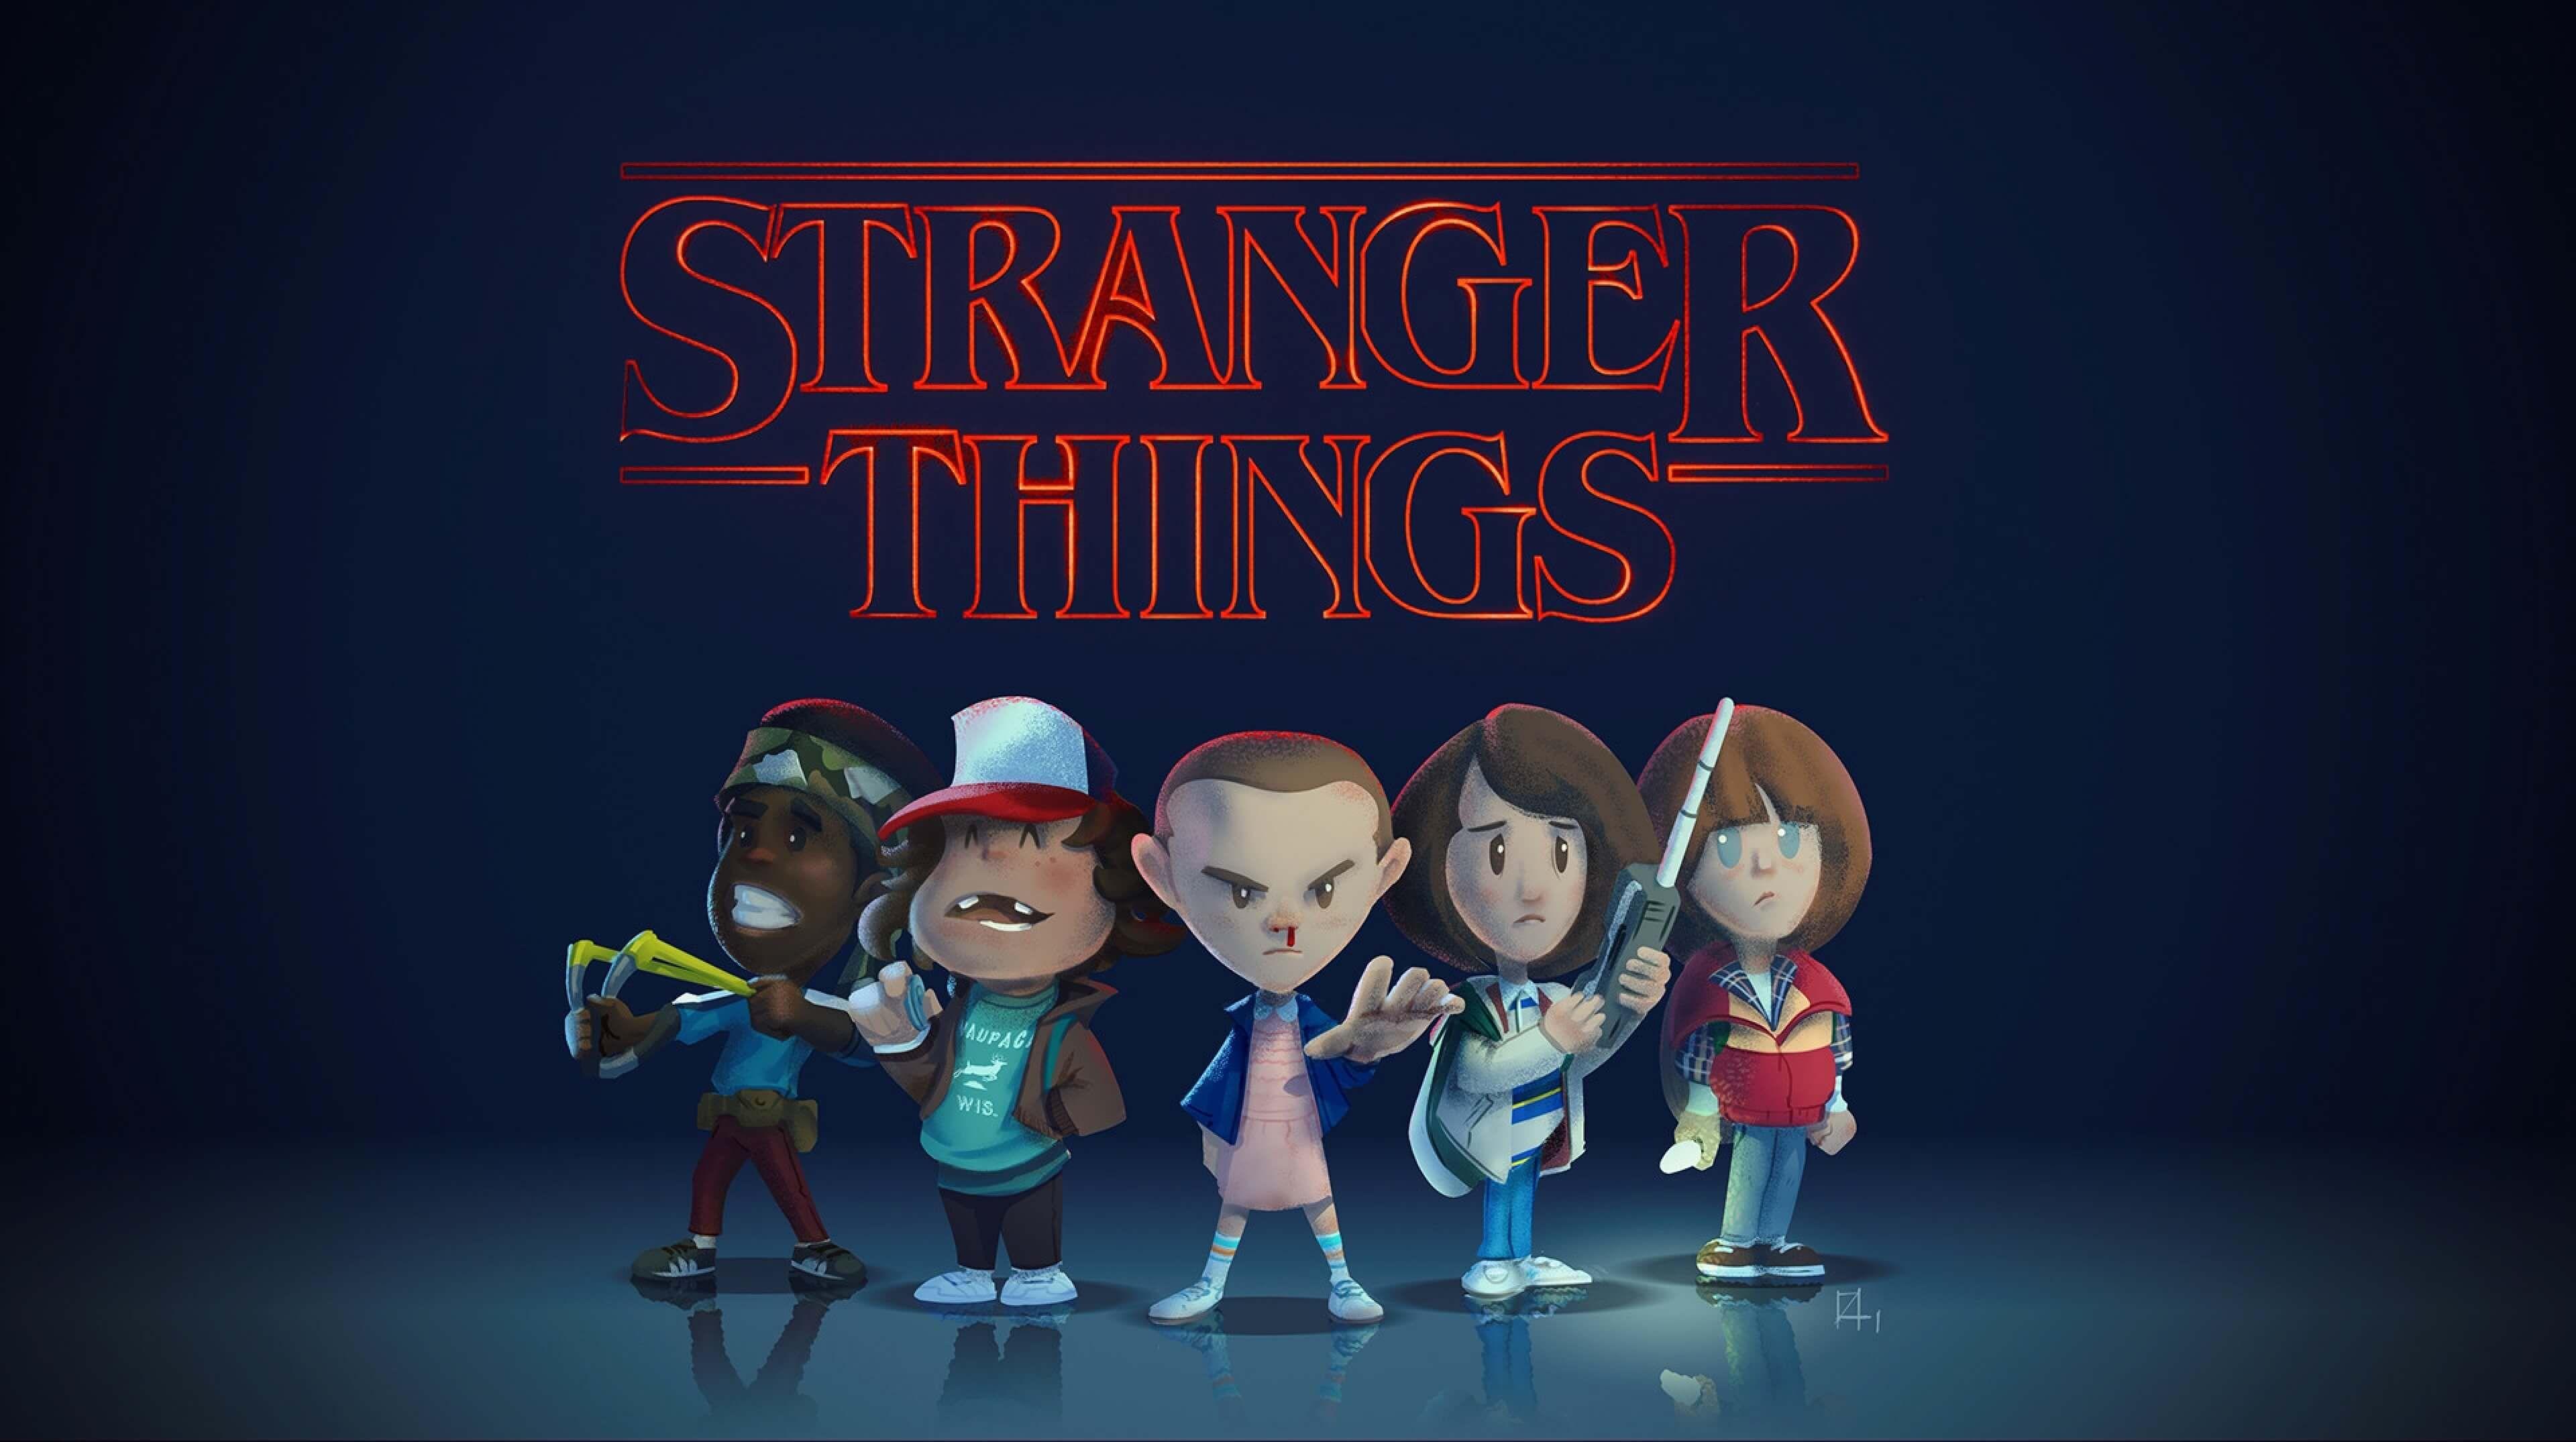 Free Stranger Things Wallpaper For Android 4k Hd Posteres De Filmes Wallpaper Ideias De Treino